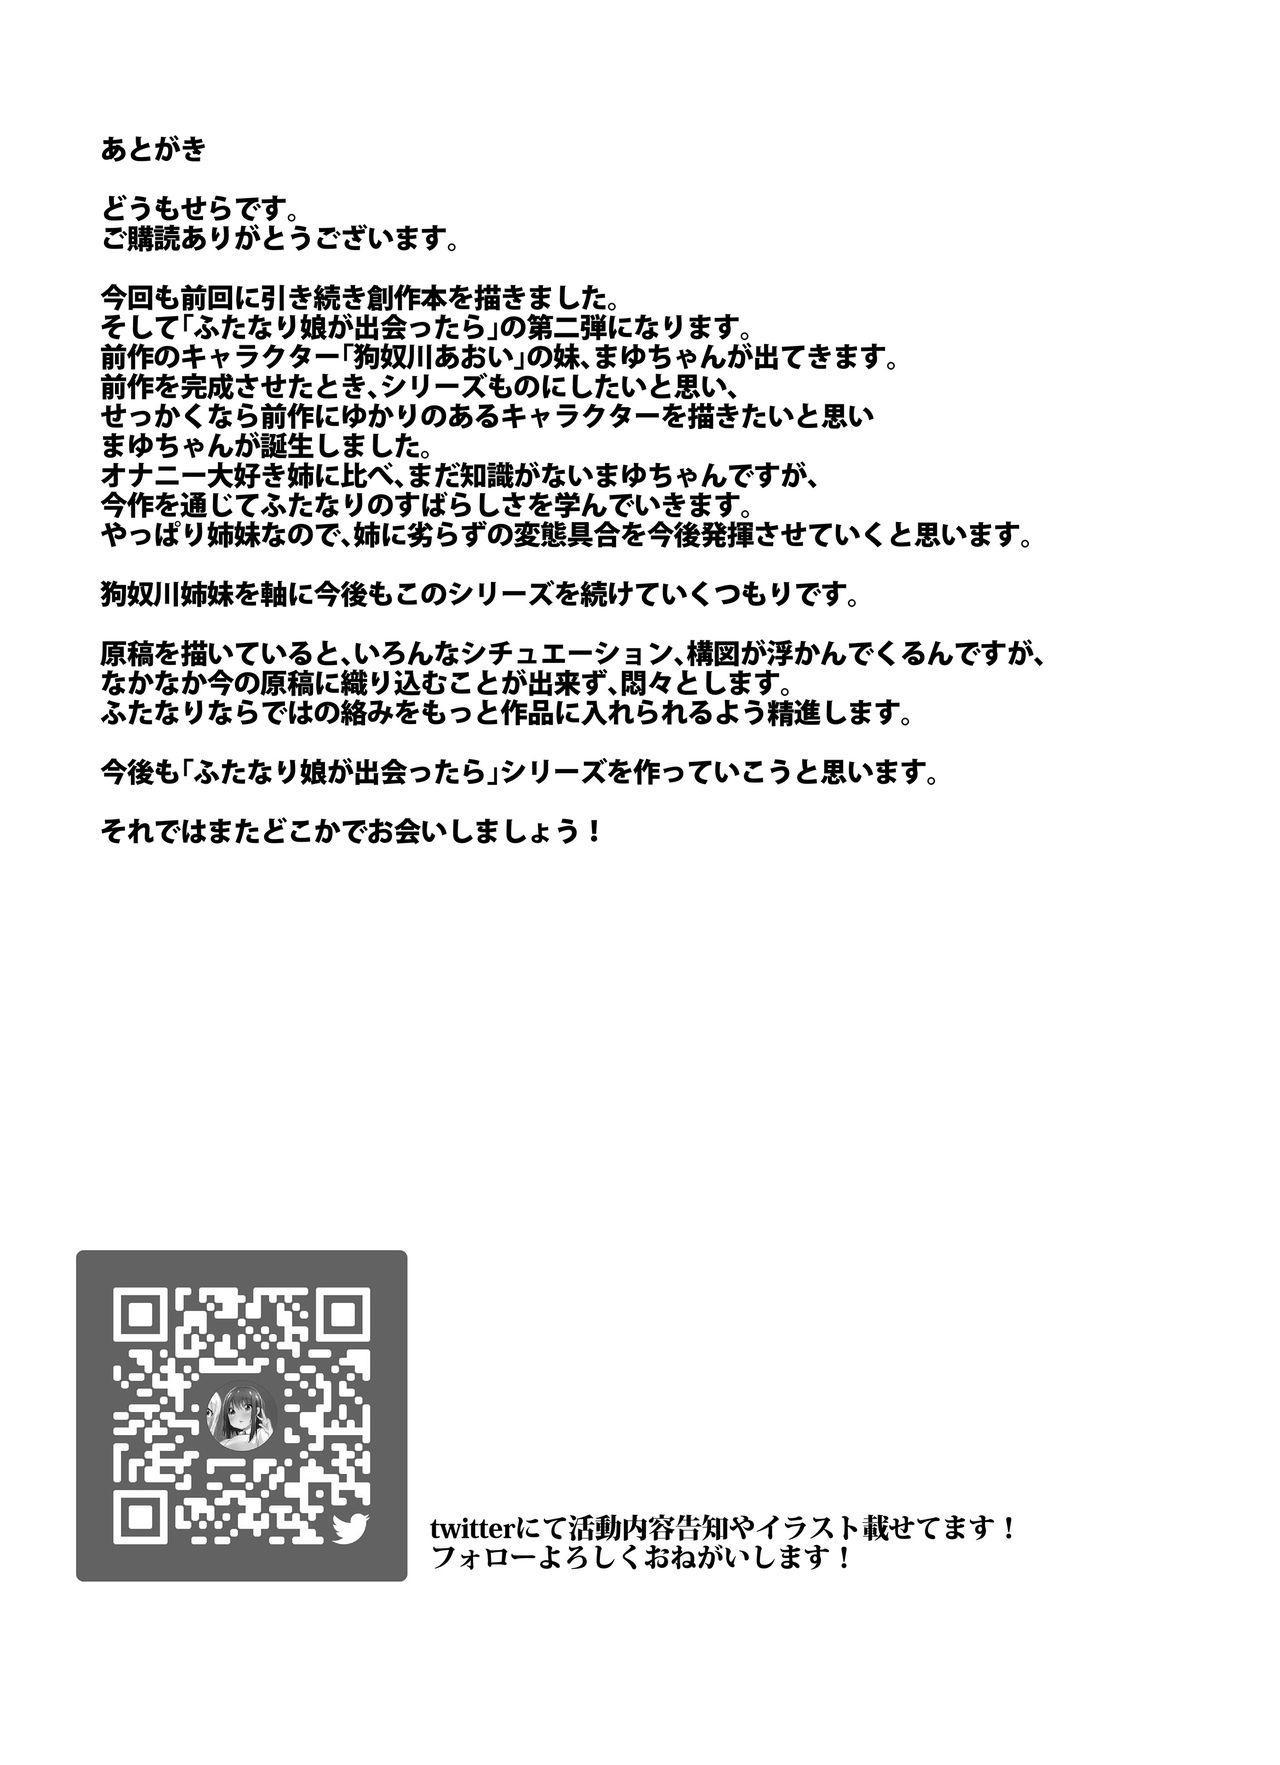 Futanari Musume ga Deattara 2 24